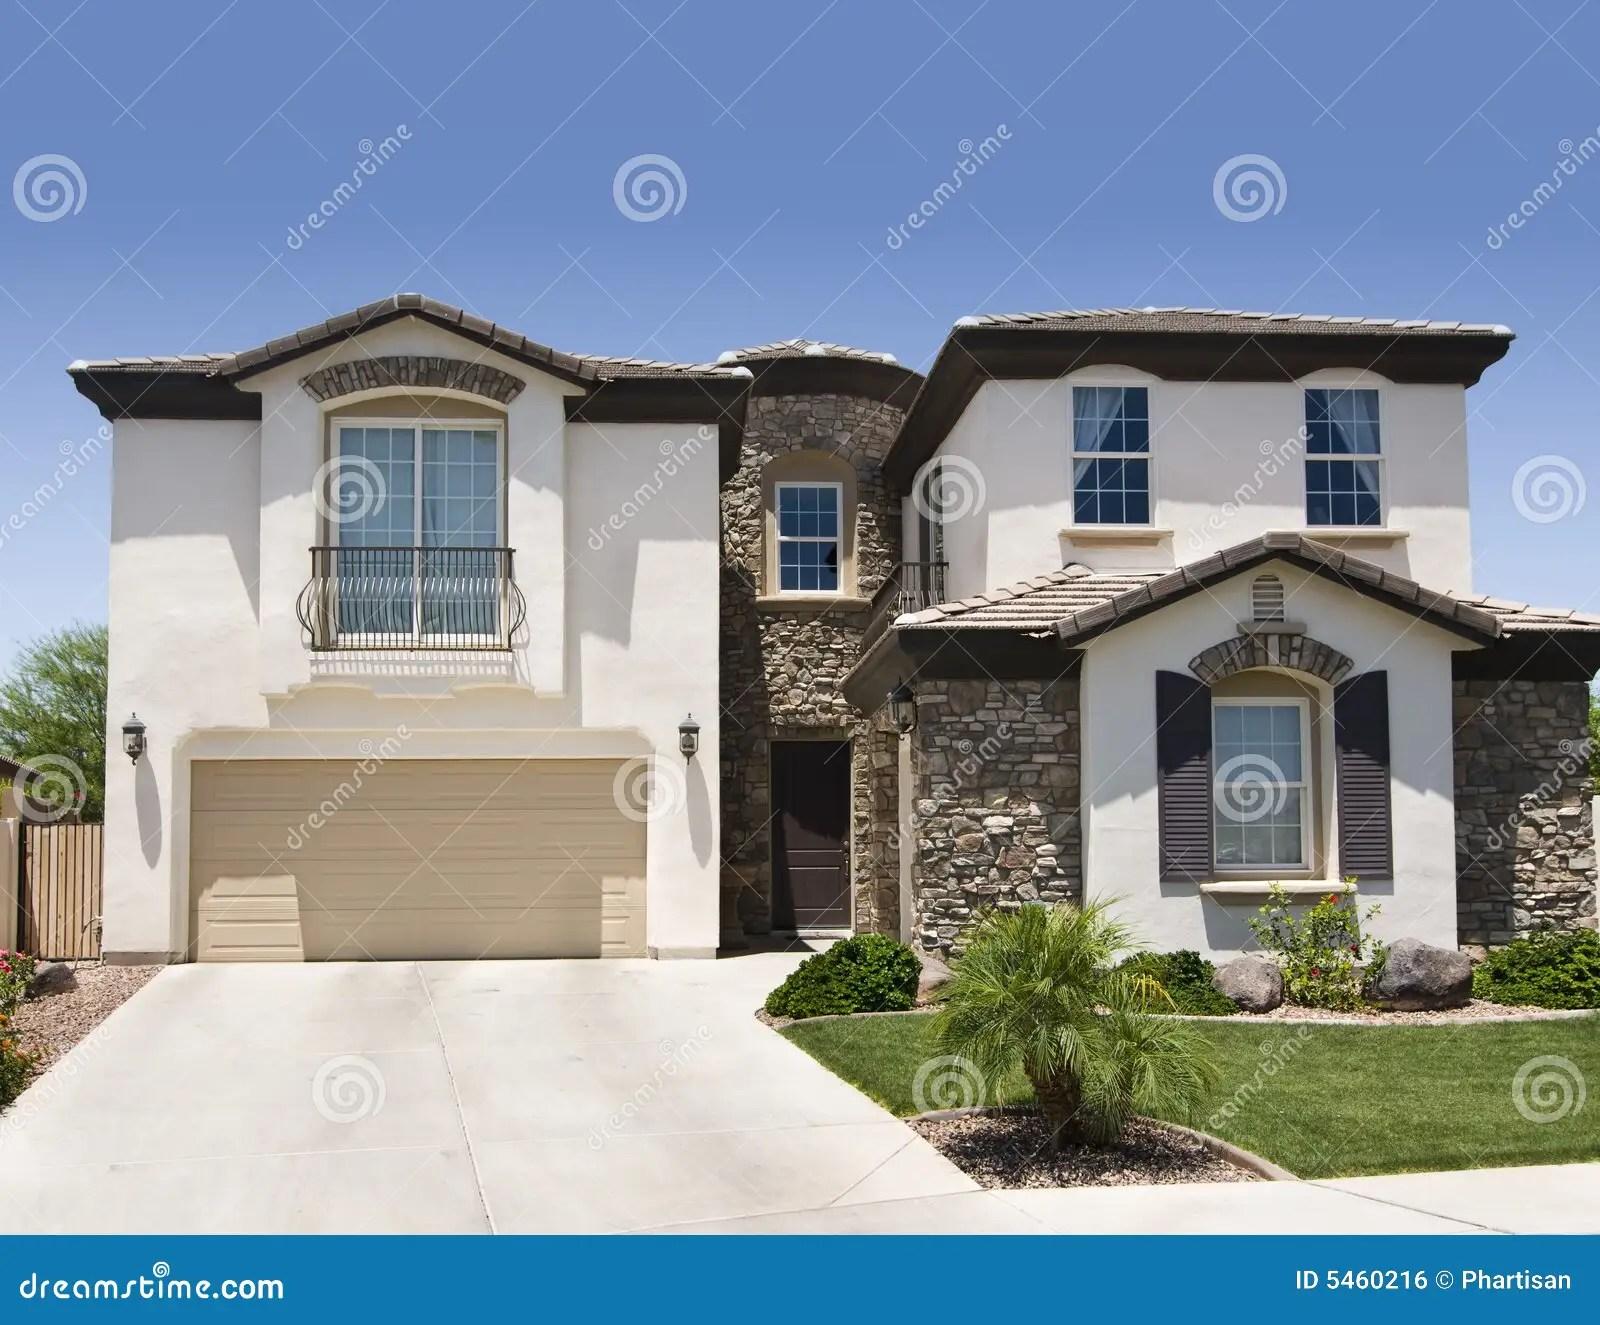 southwestern homes southwestern home plans southwestern style home designs